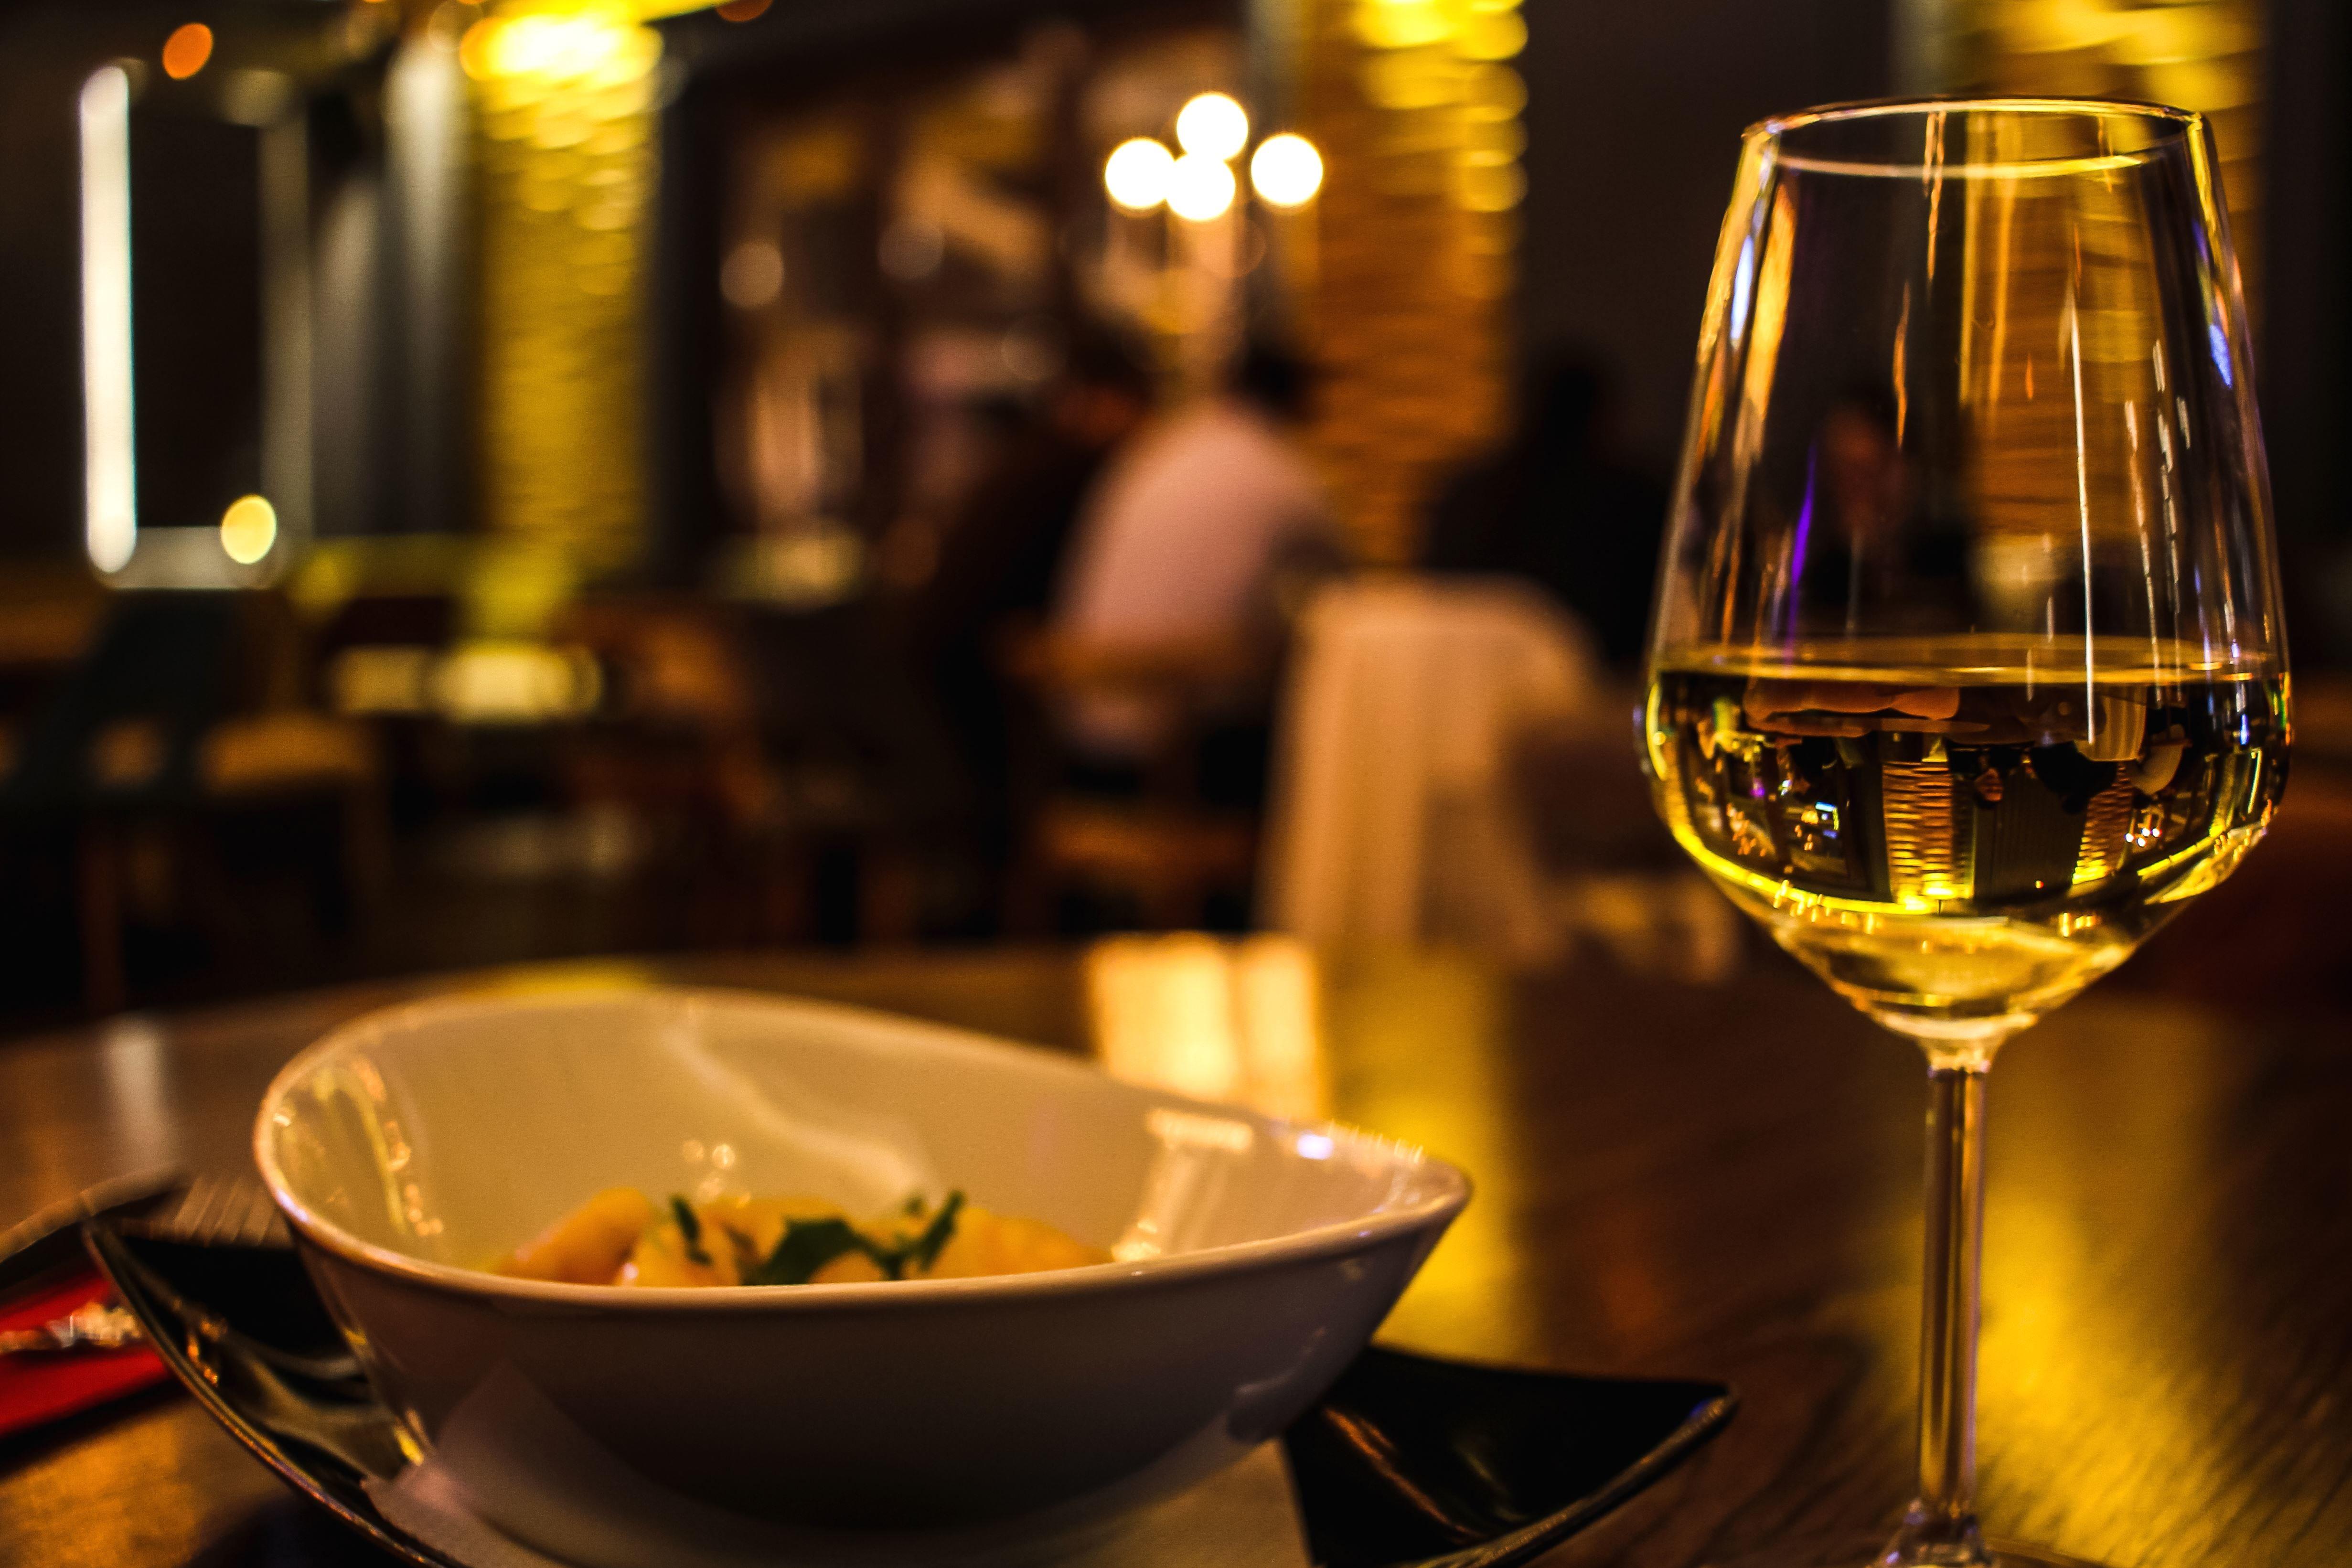 Image Libre D 238 Ner Boisson Nourriture Verre Restaurant